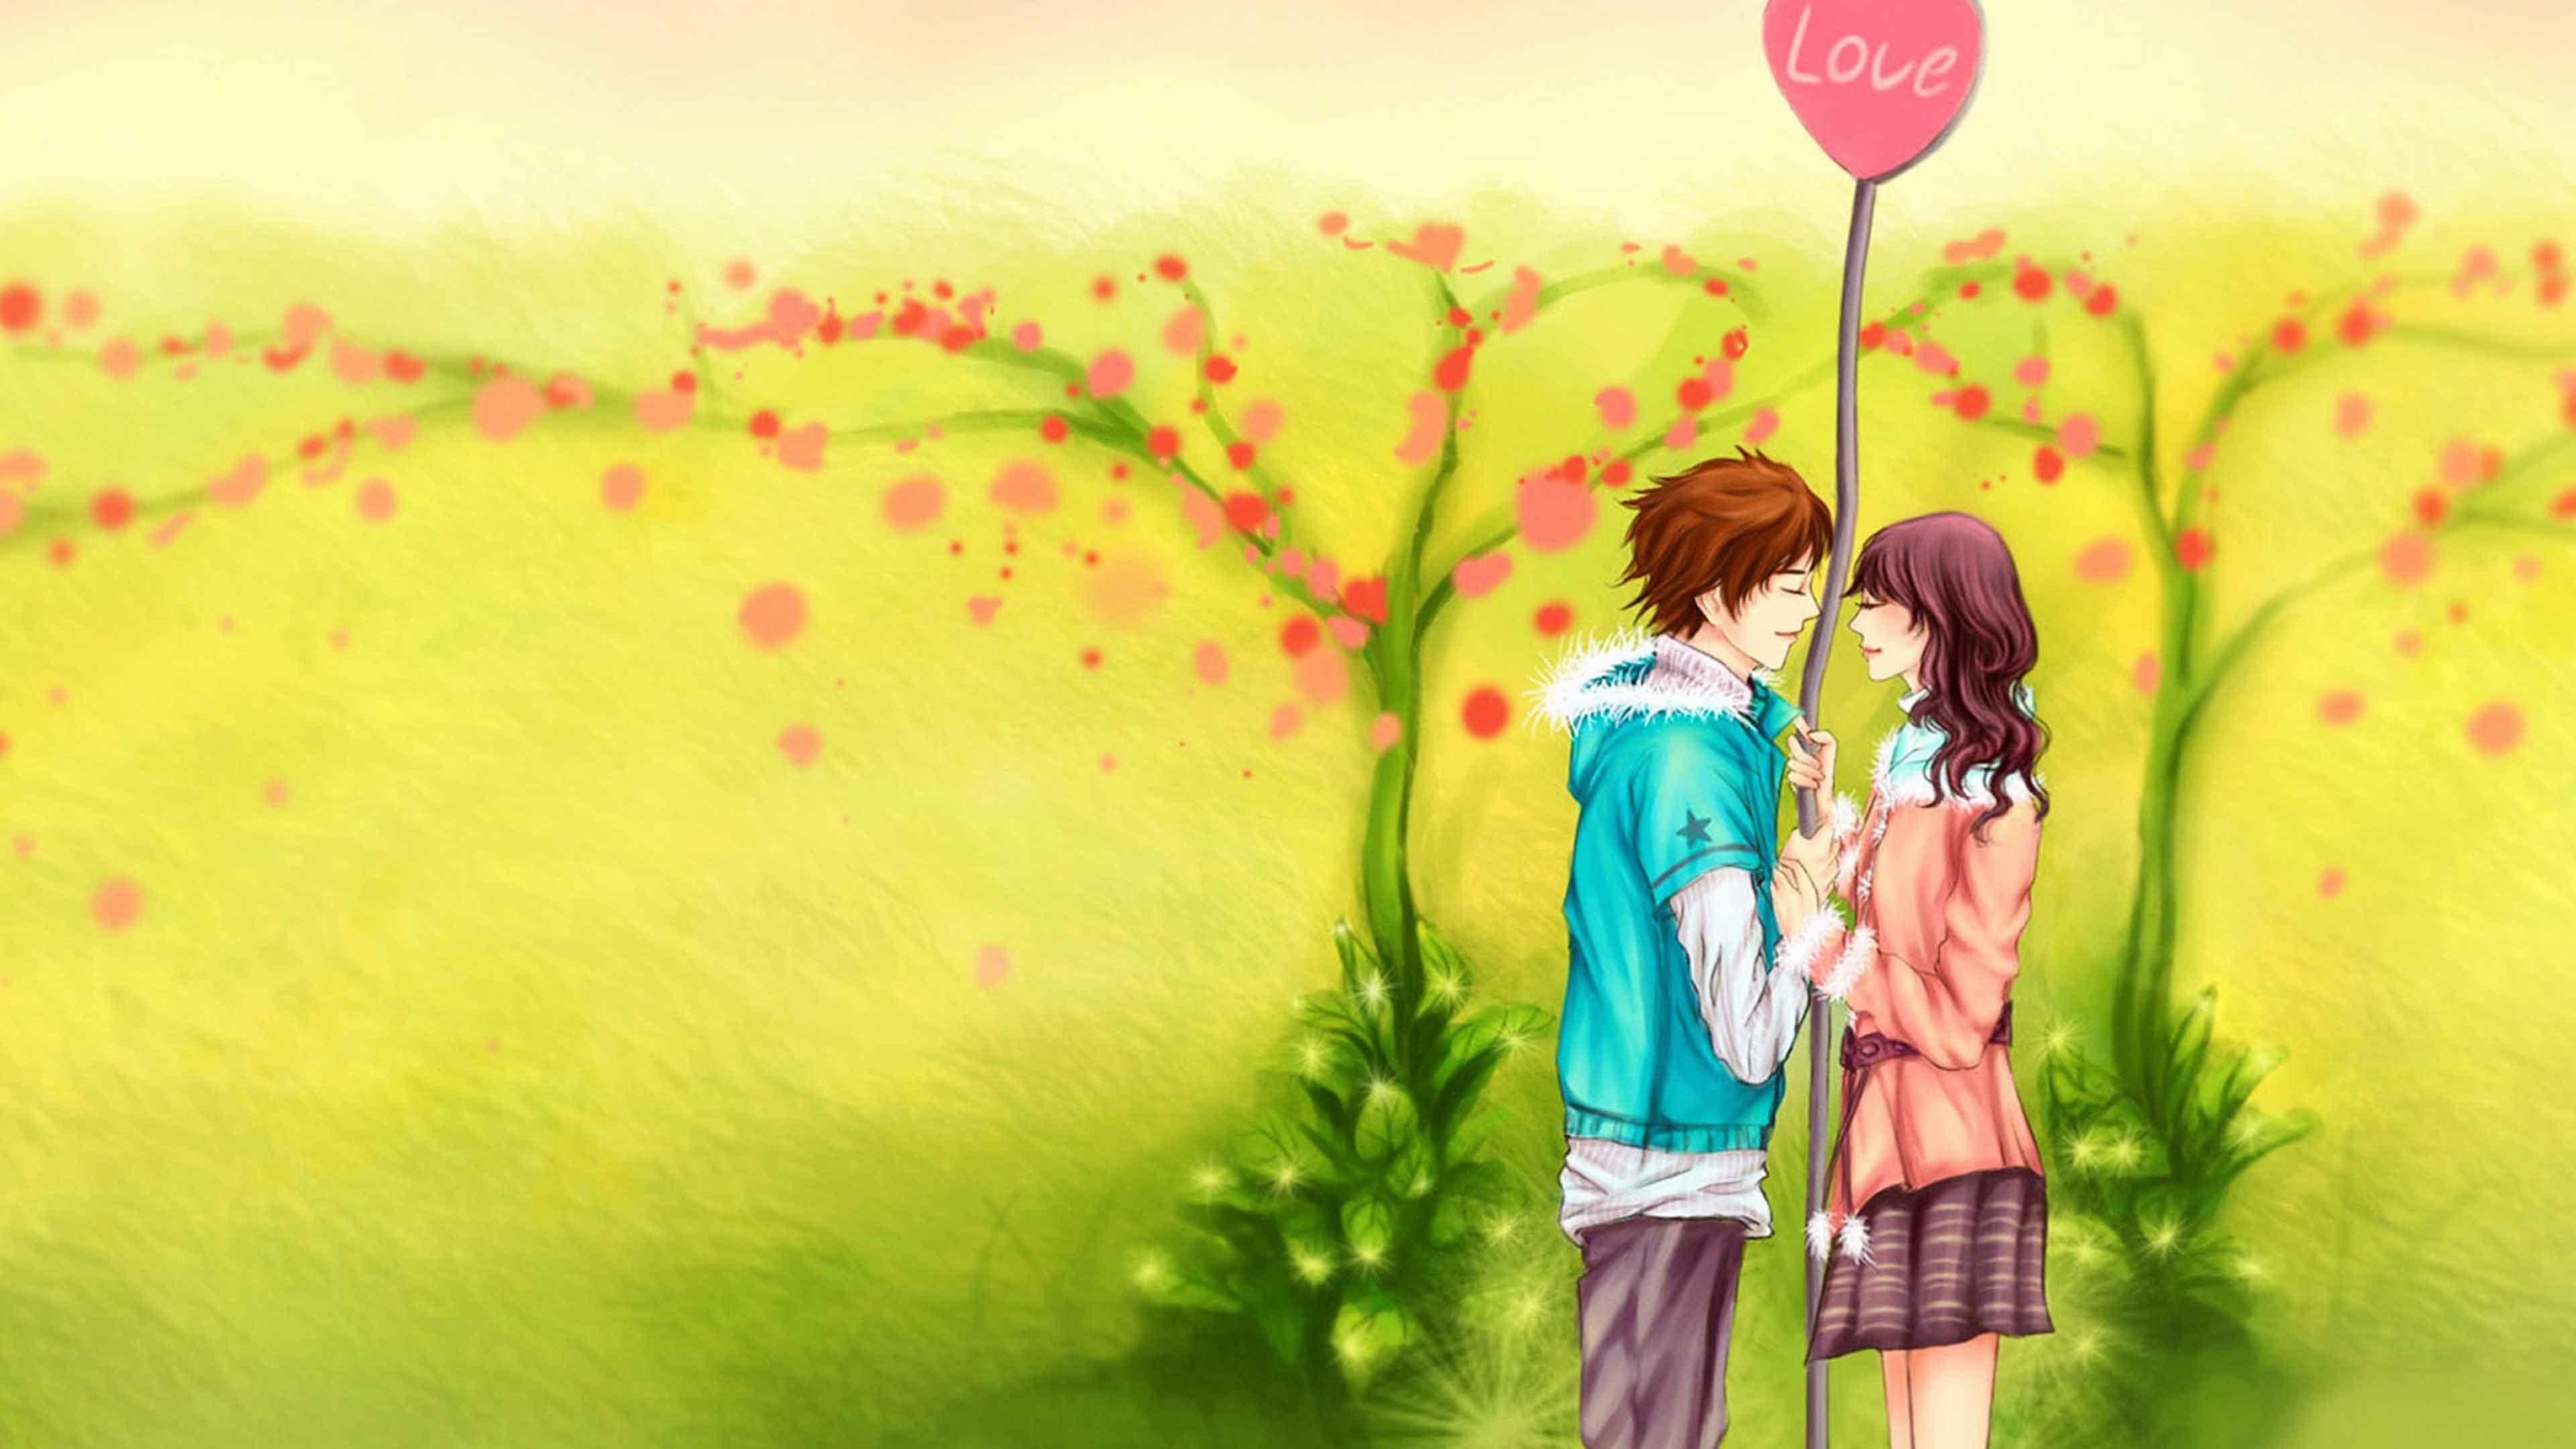 3d Love Couple Cartoon Wallpapers Download - 3d Wallpapers